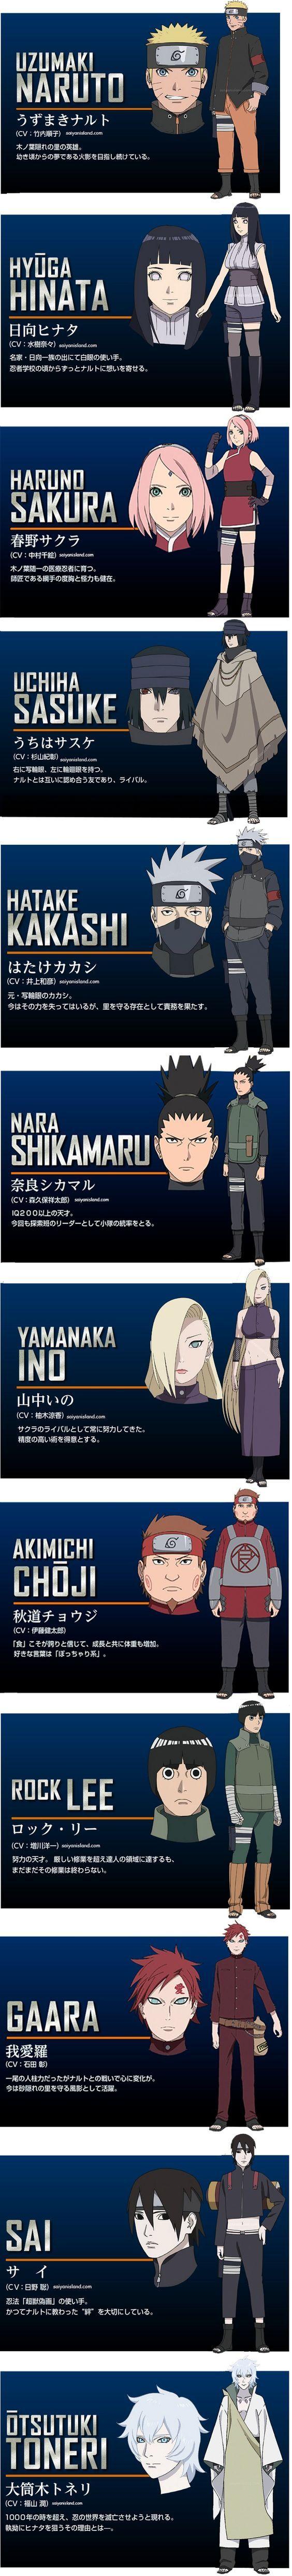 Naruto                                                                                                                                                                                 More